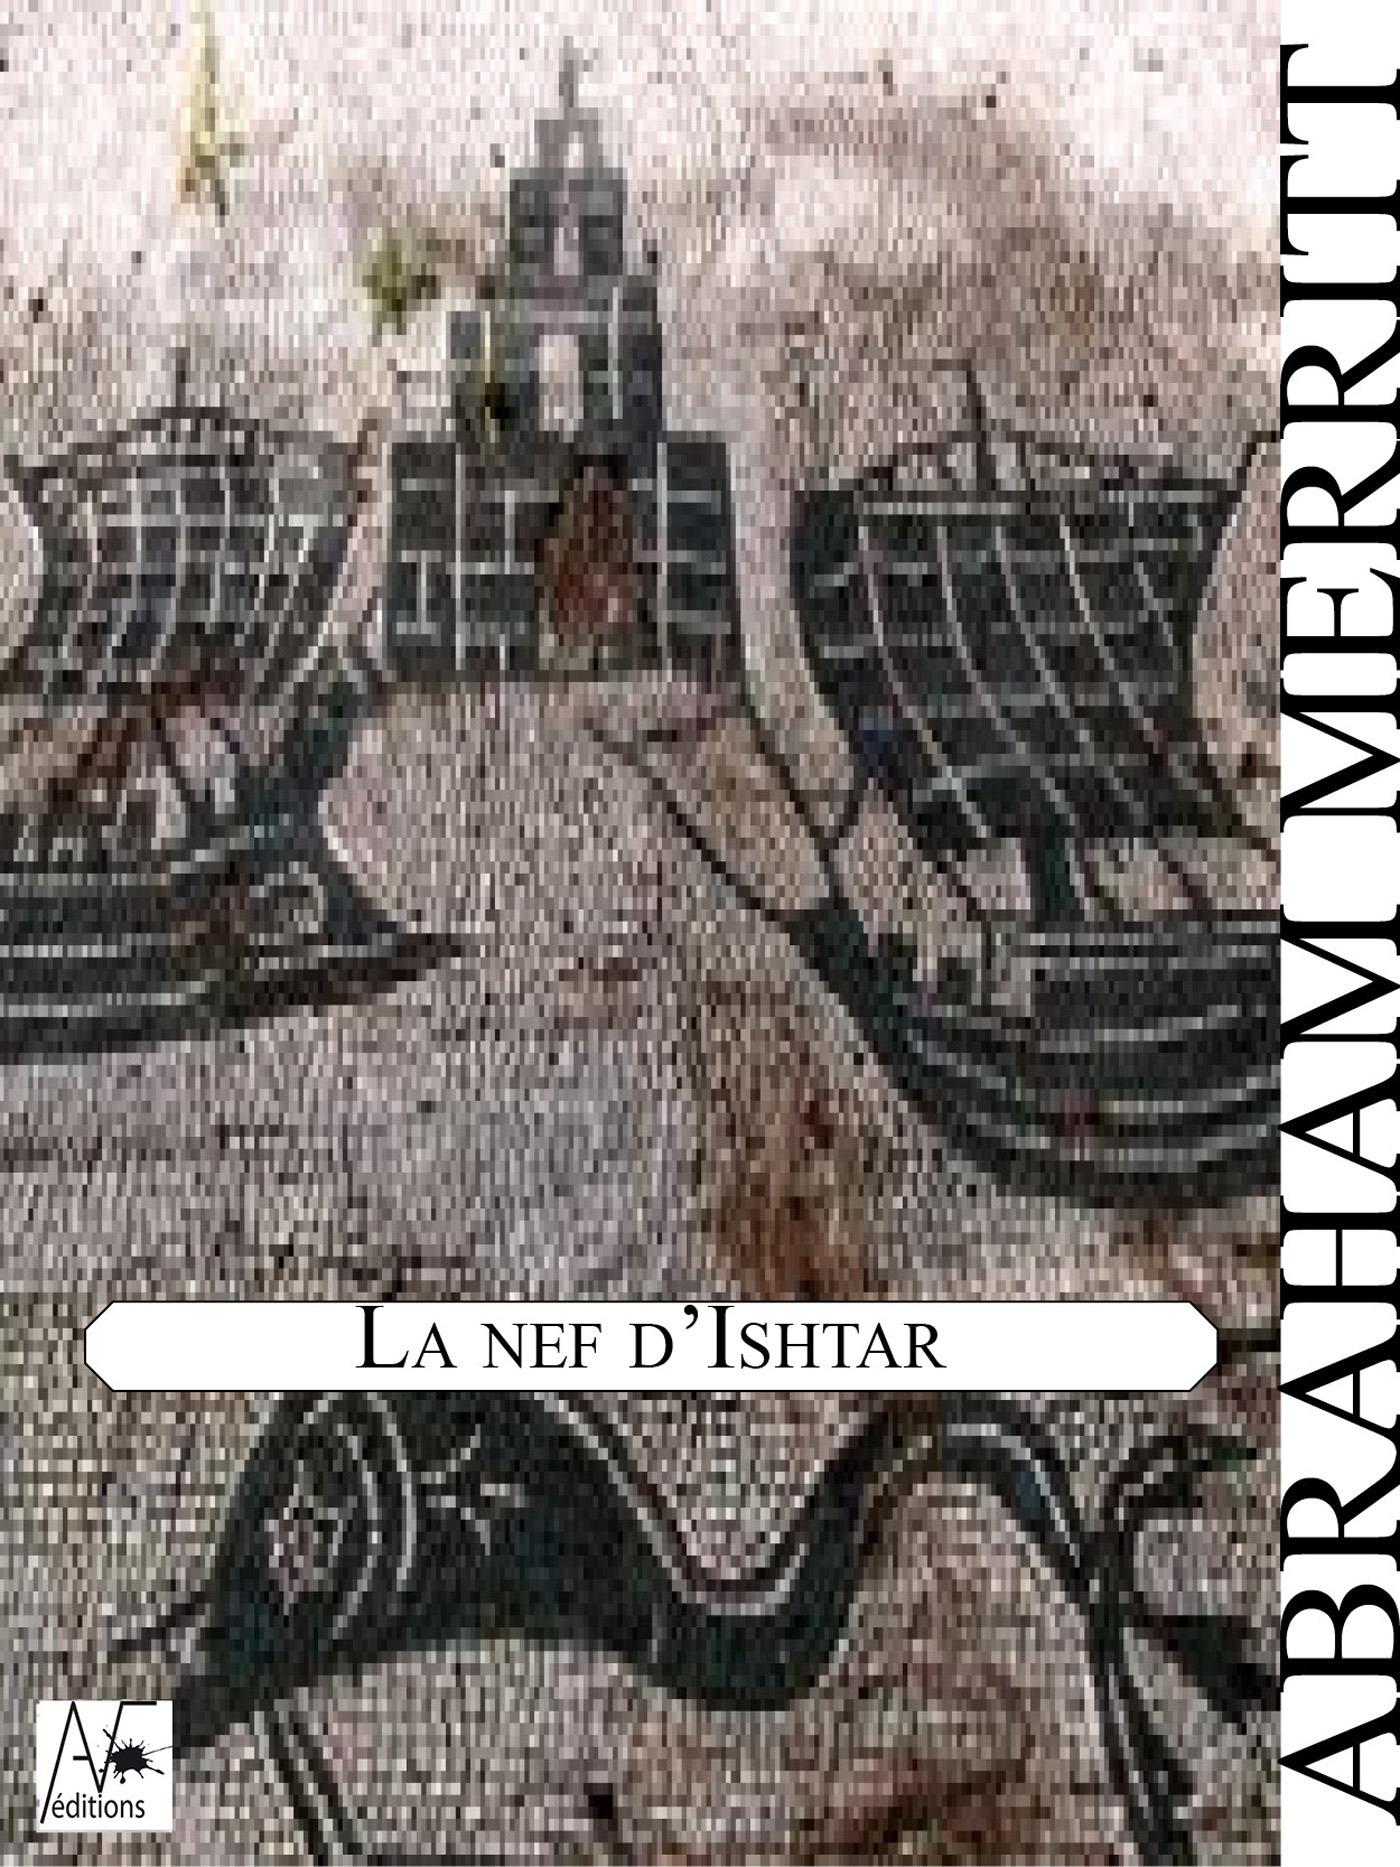 La nef d'Ishtar